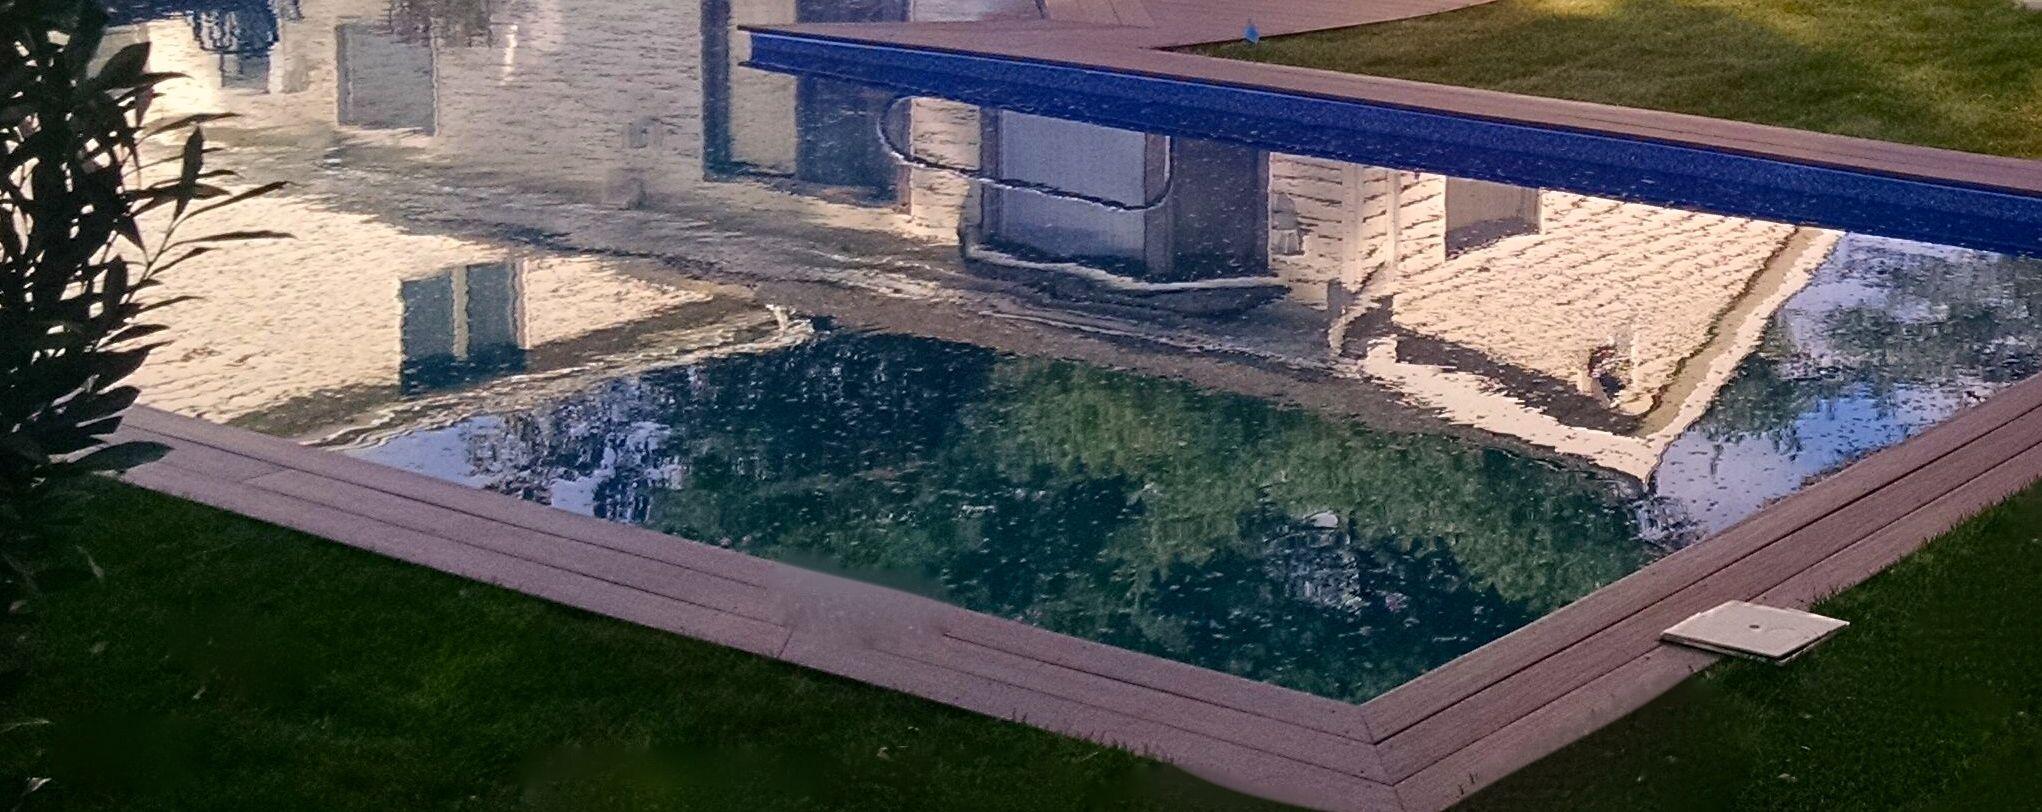 Adding New Pool Coping